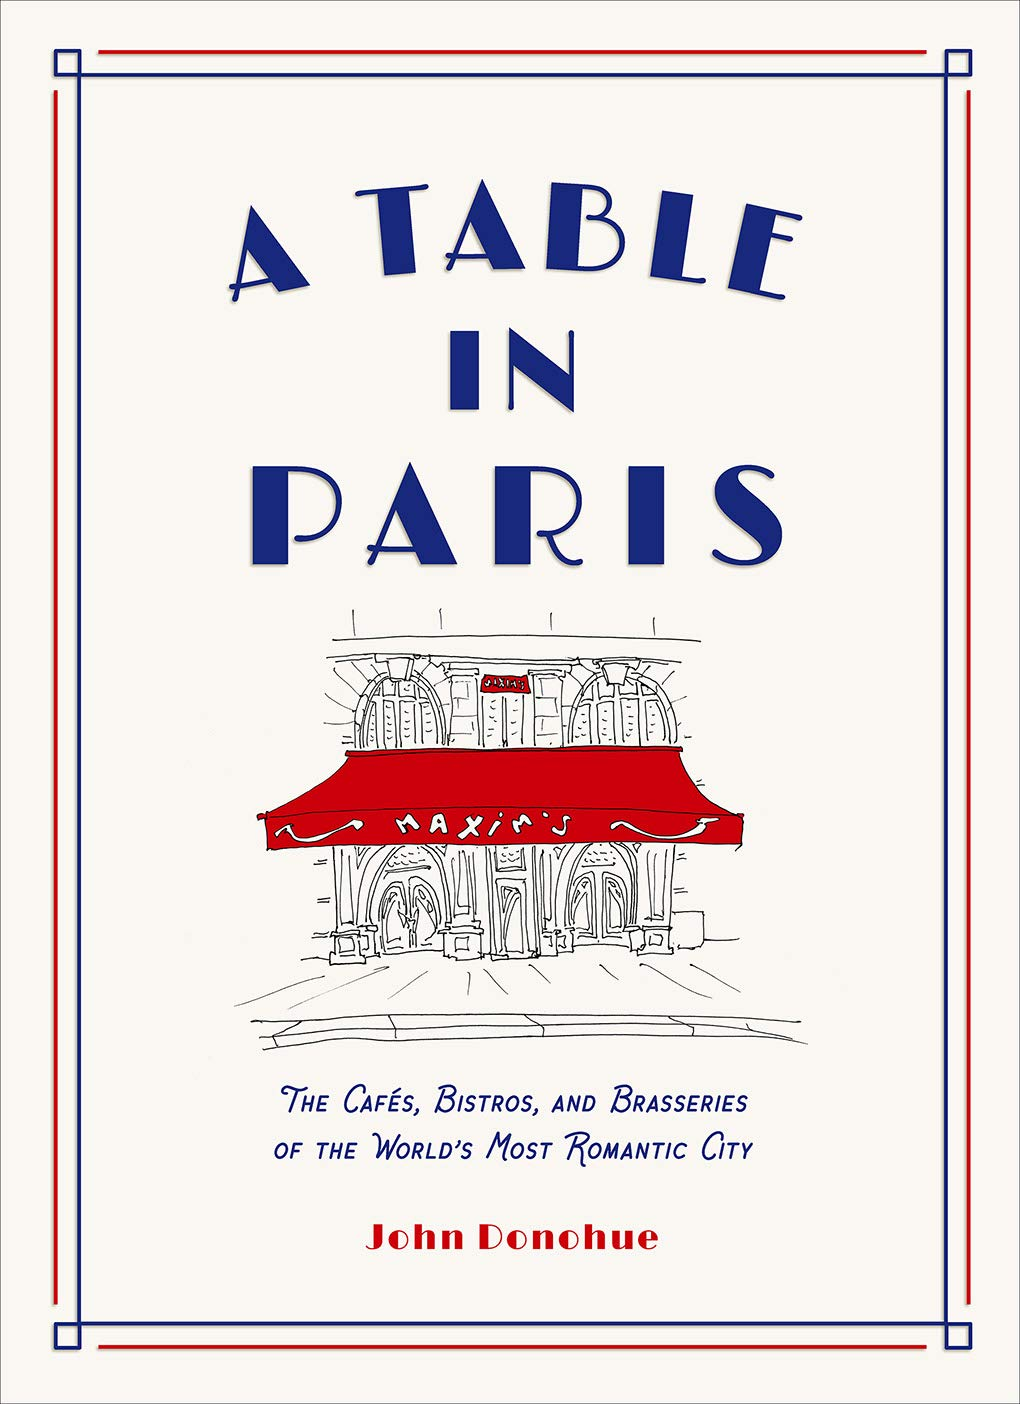 à table in paris book